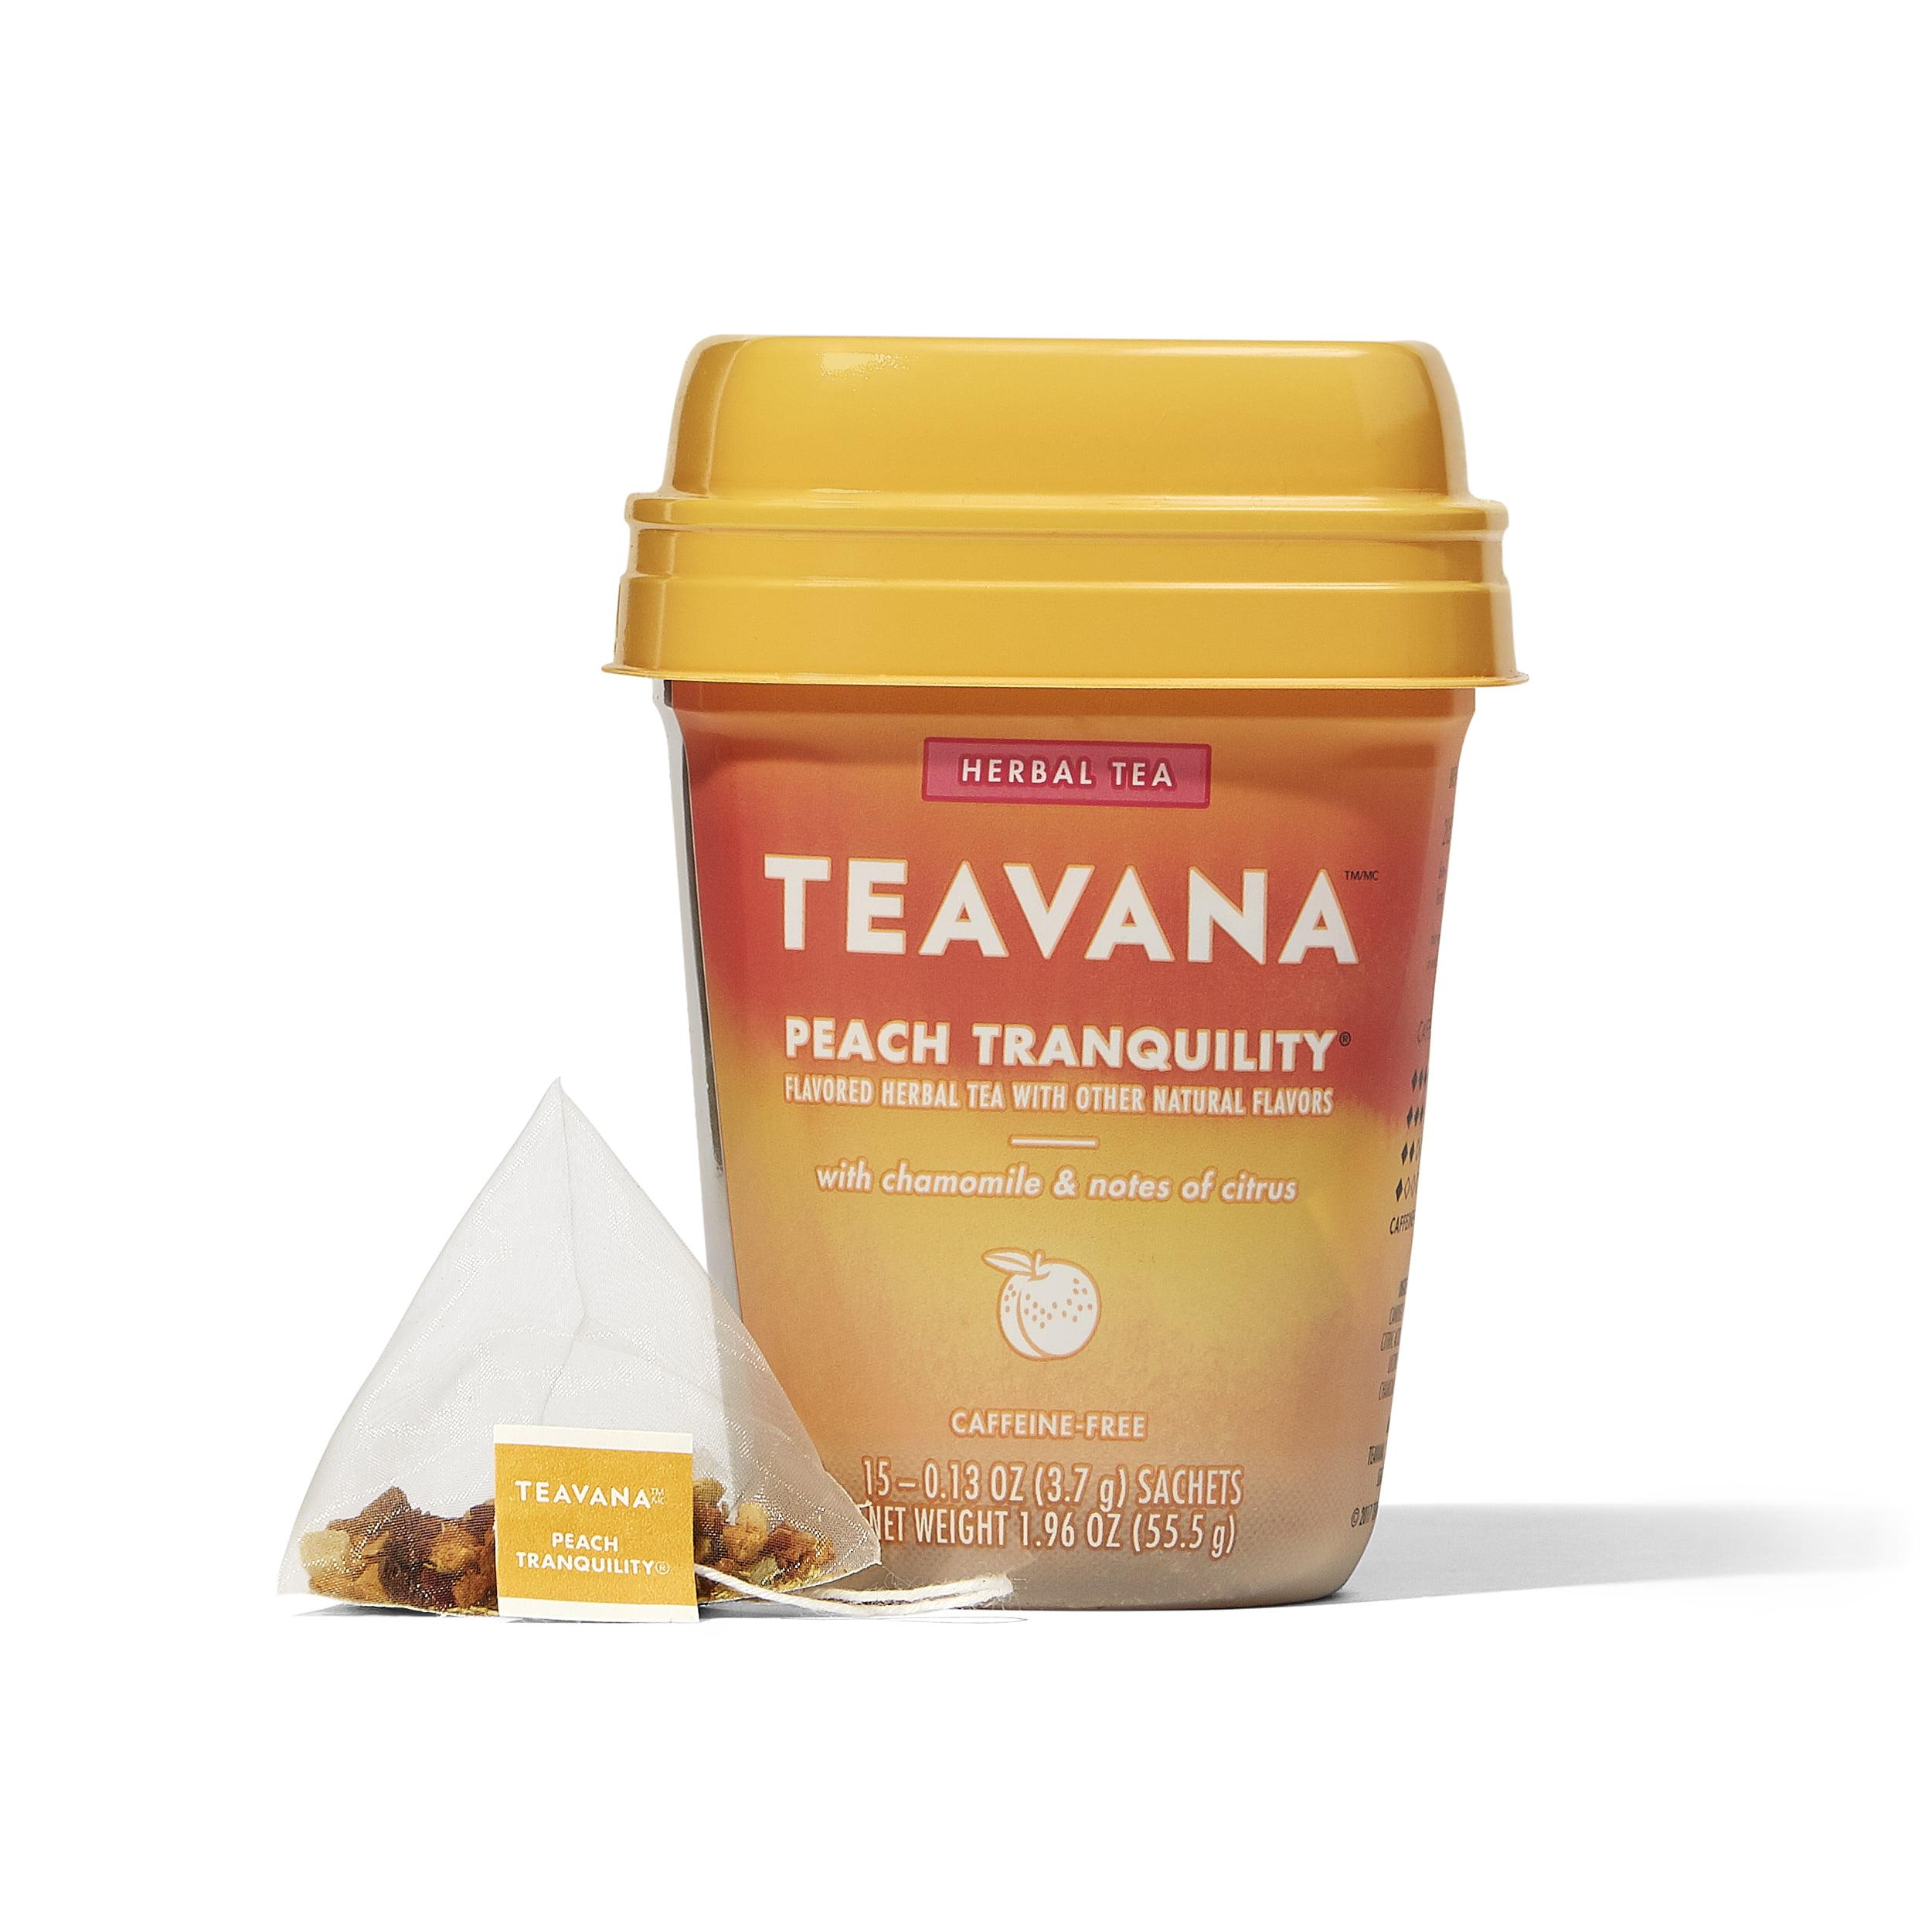 Teavana Peach Tranquility Herbal Tea